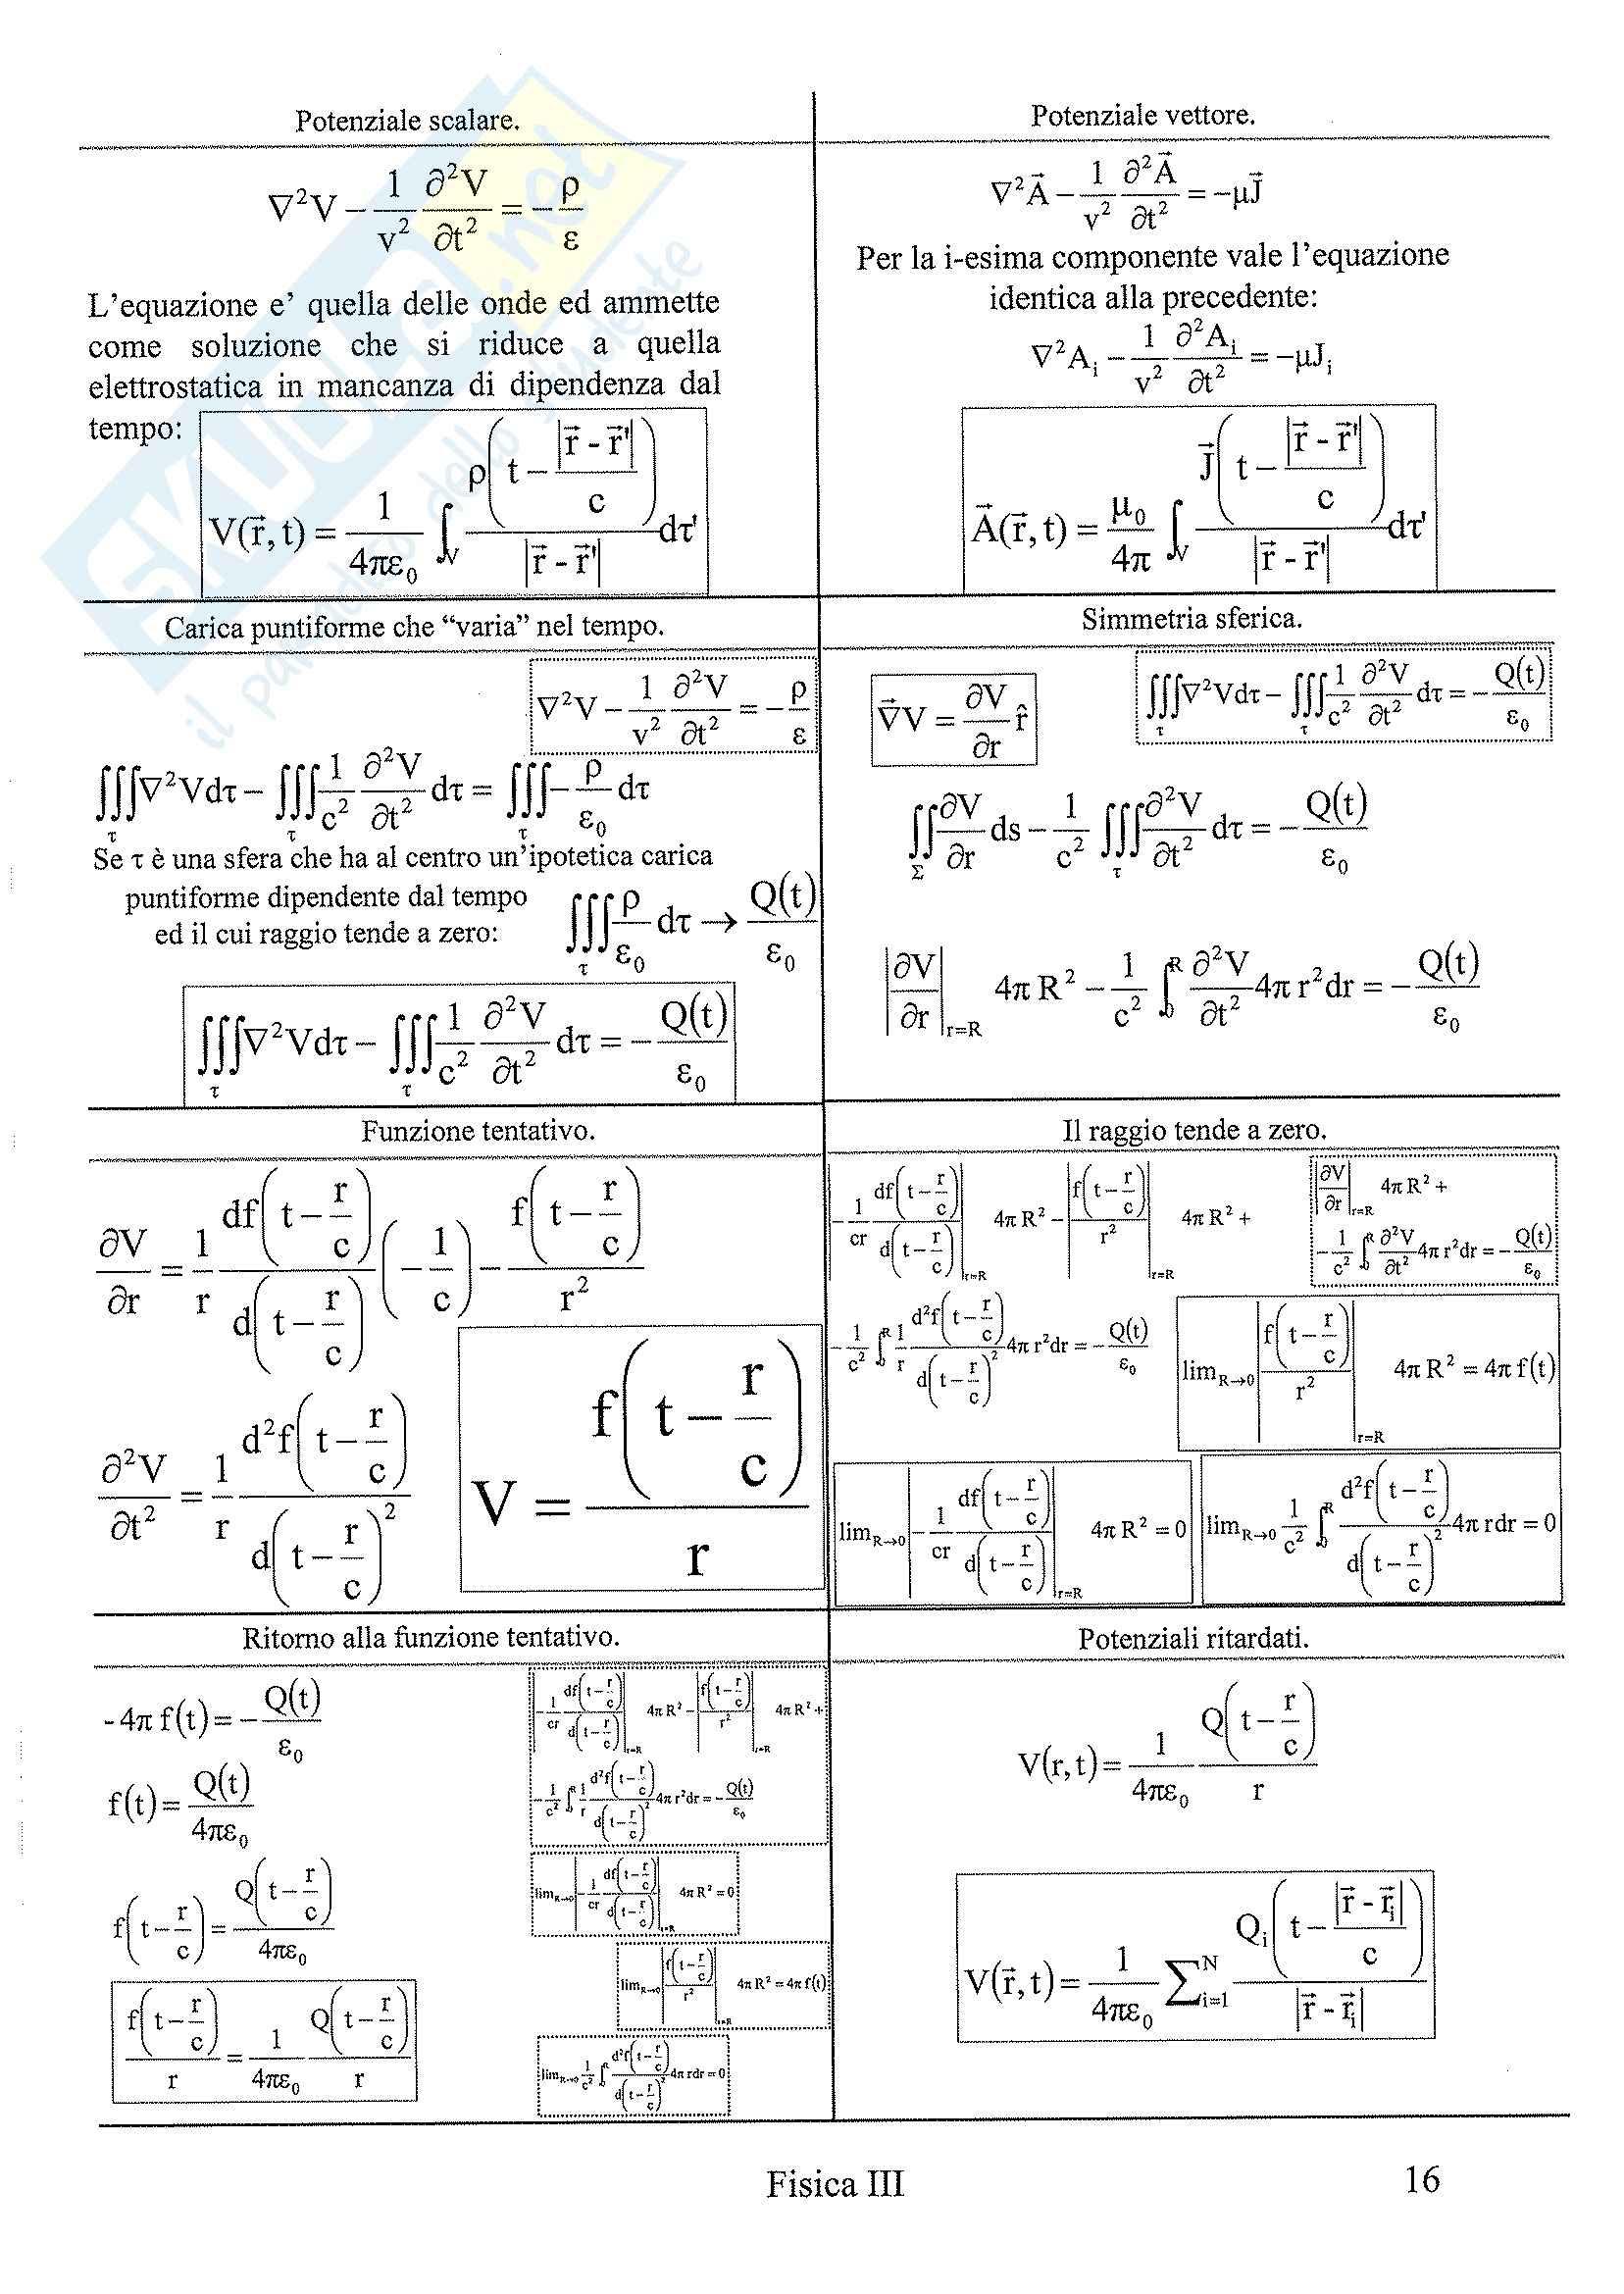 Fisica III – Dispensa Pag. 16